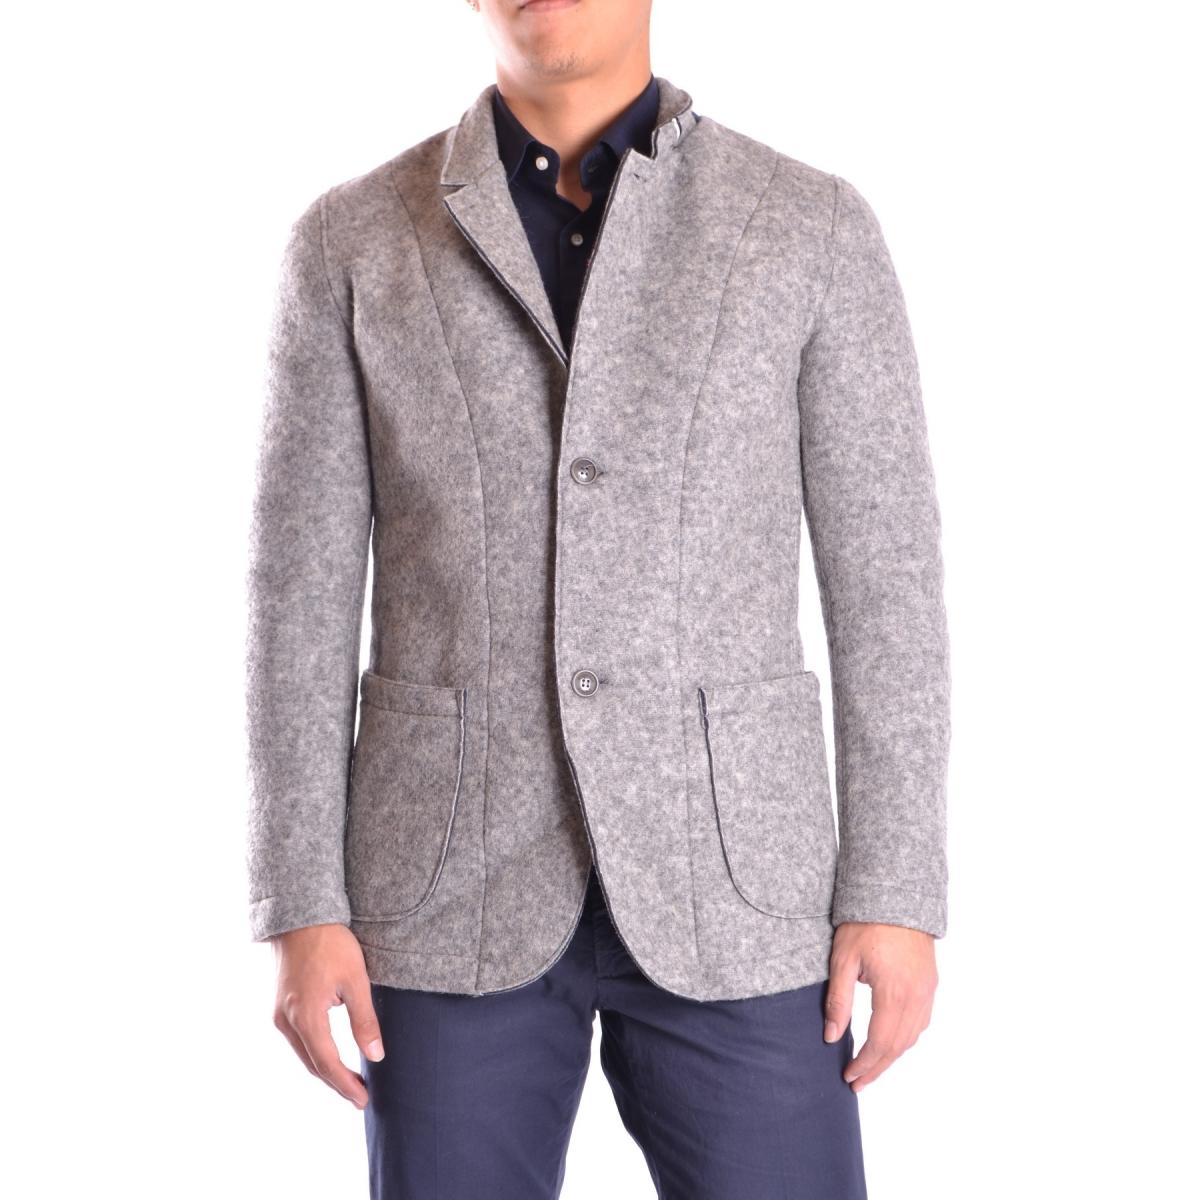 Etiqueta Negra giacca AN1896 16203IT -70%